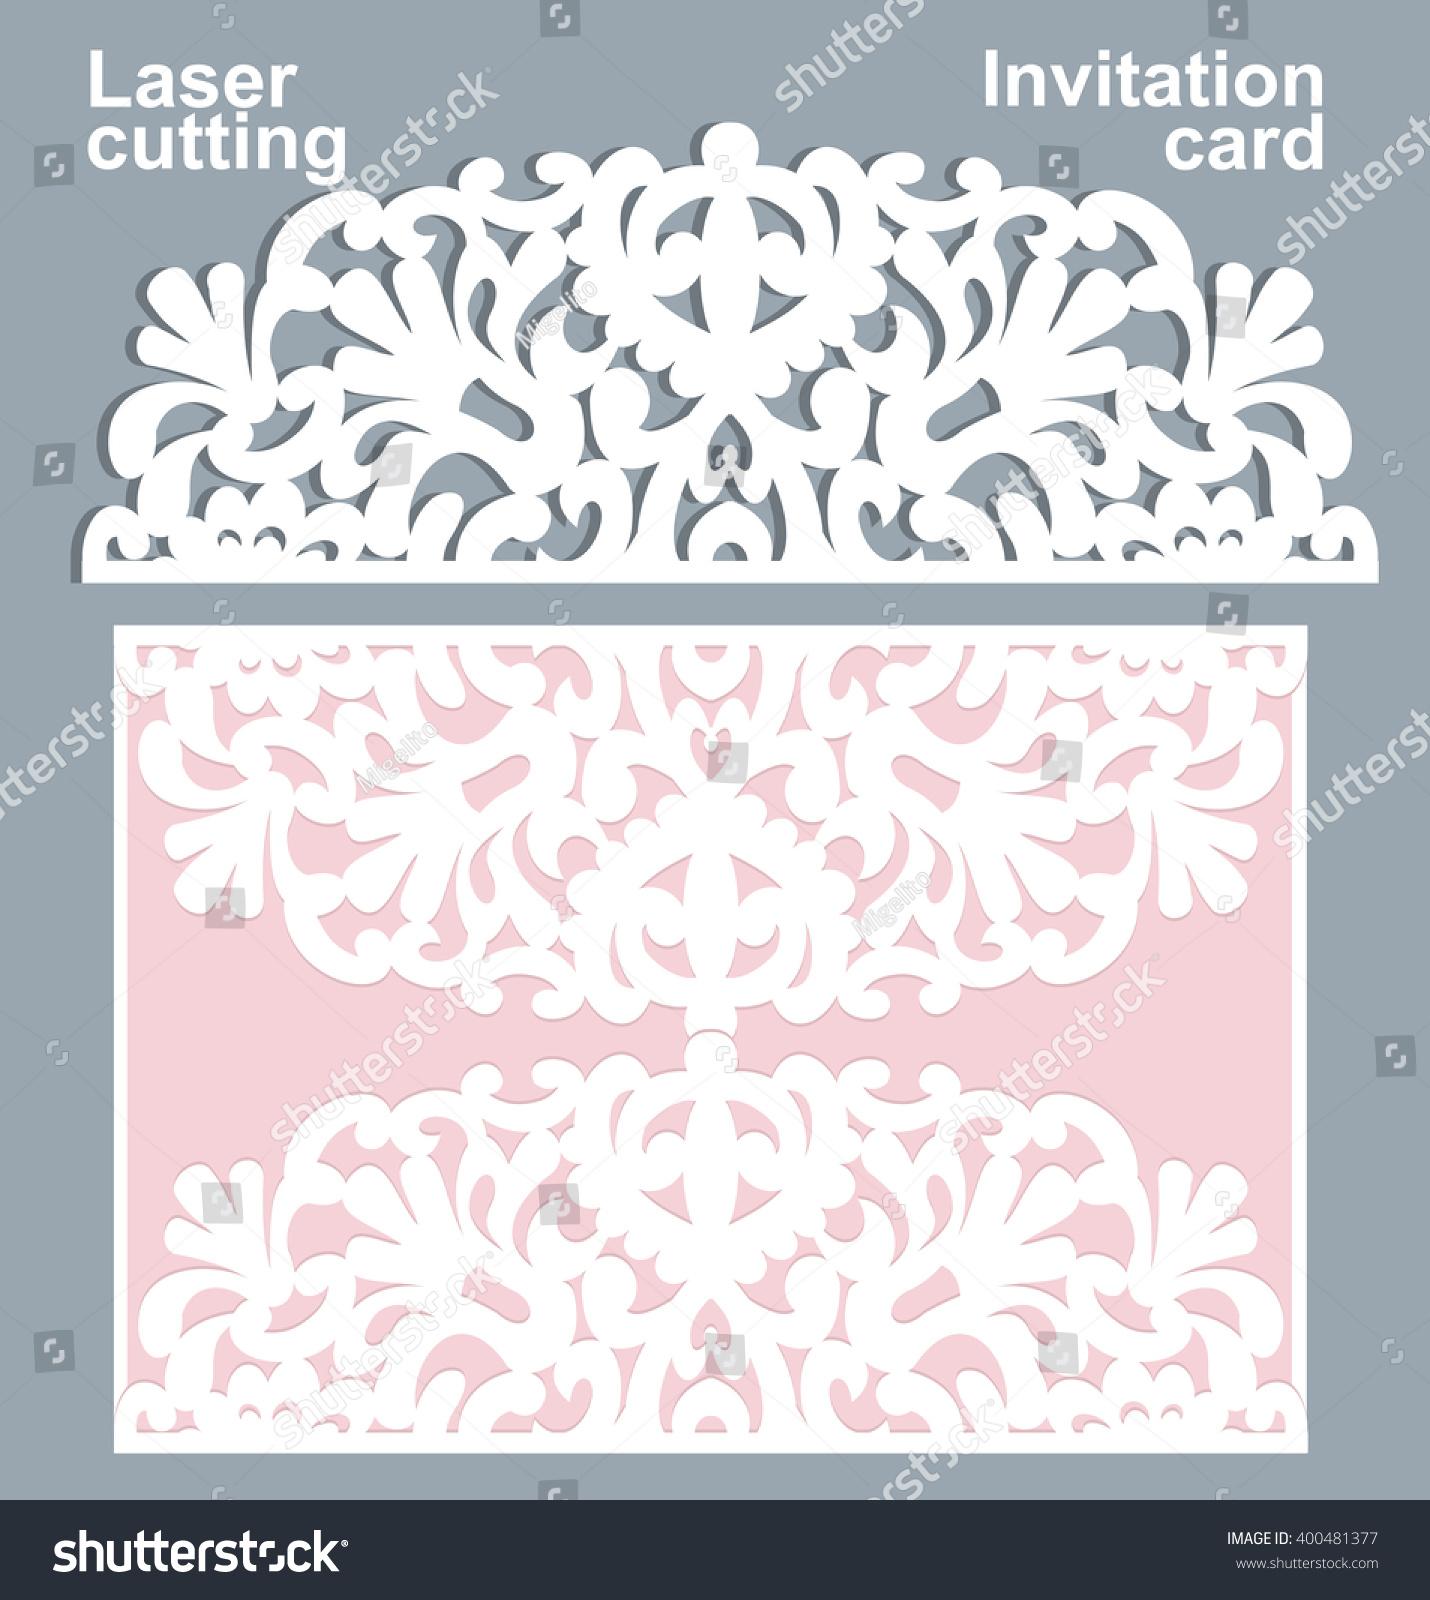 Vector Die Laser Cut Wedding Card Stock Vector